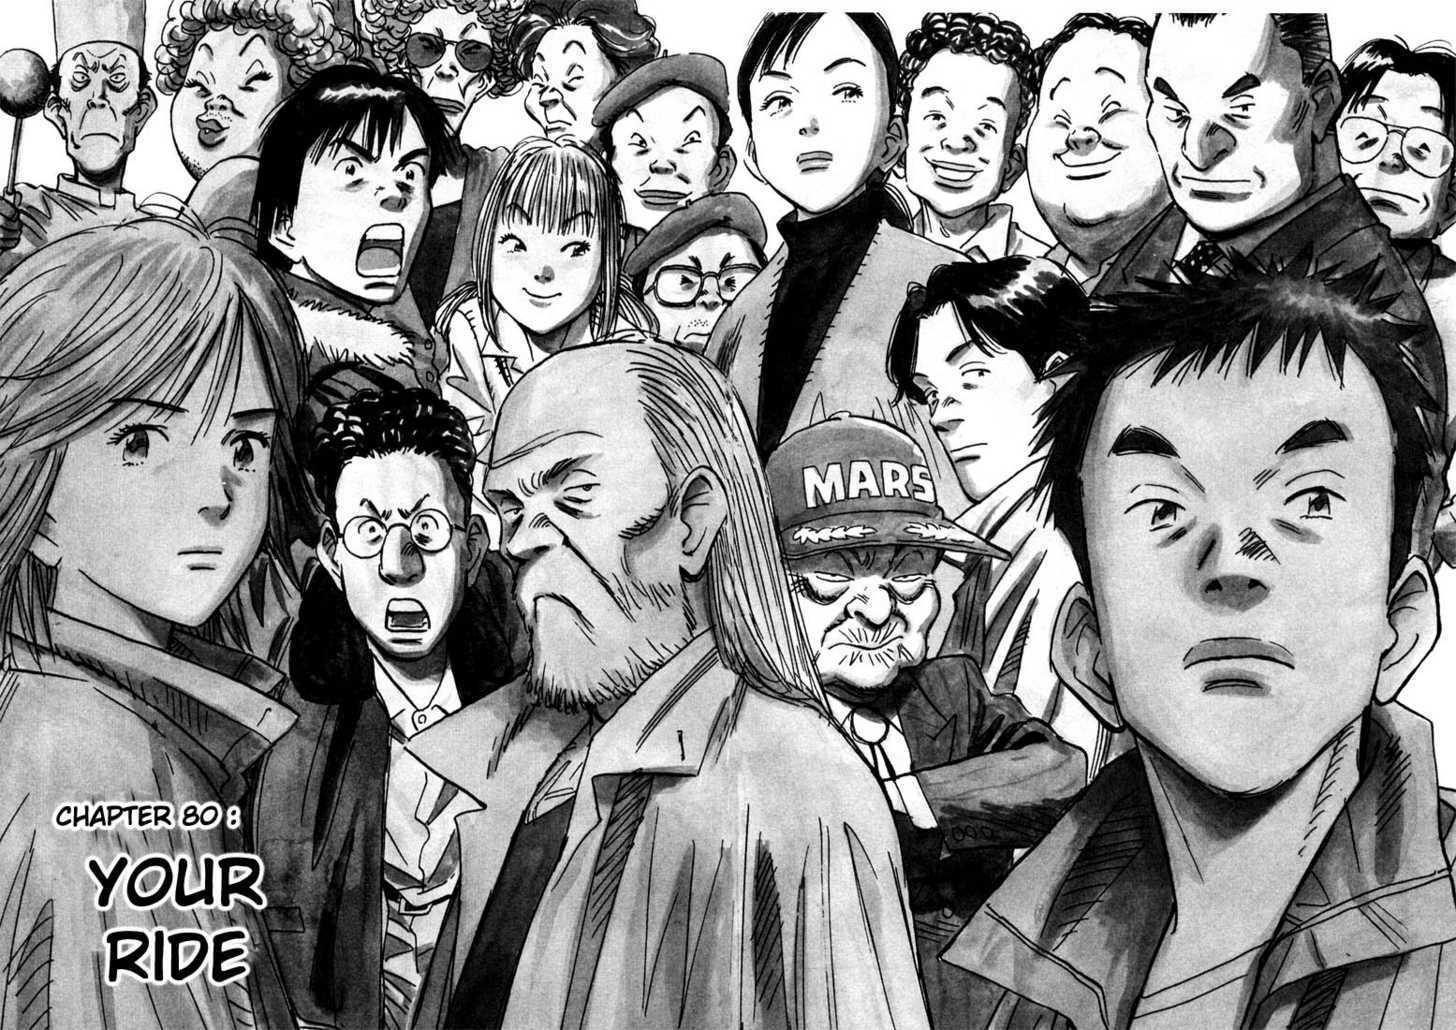 Wallpaper : drawing, people, illustration, cartoon, Naoki Urasawa